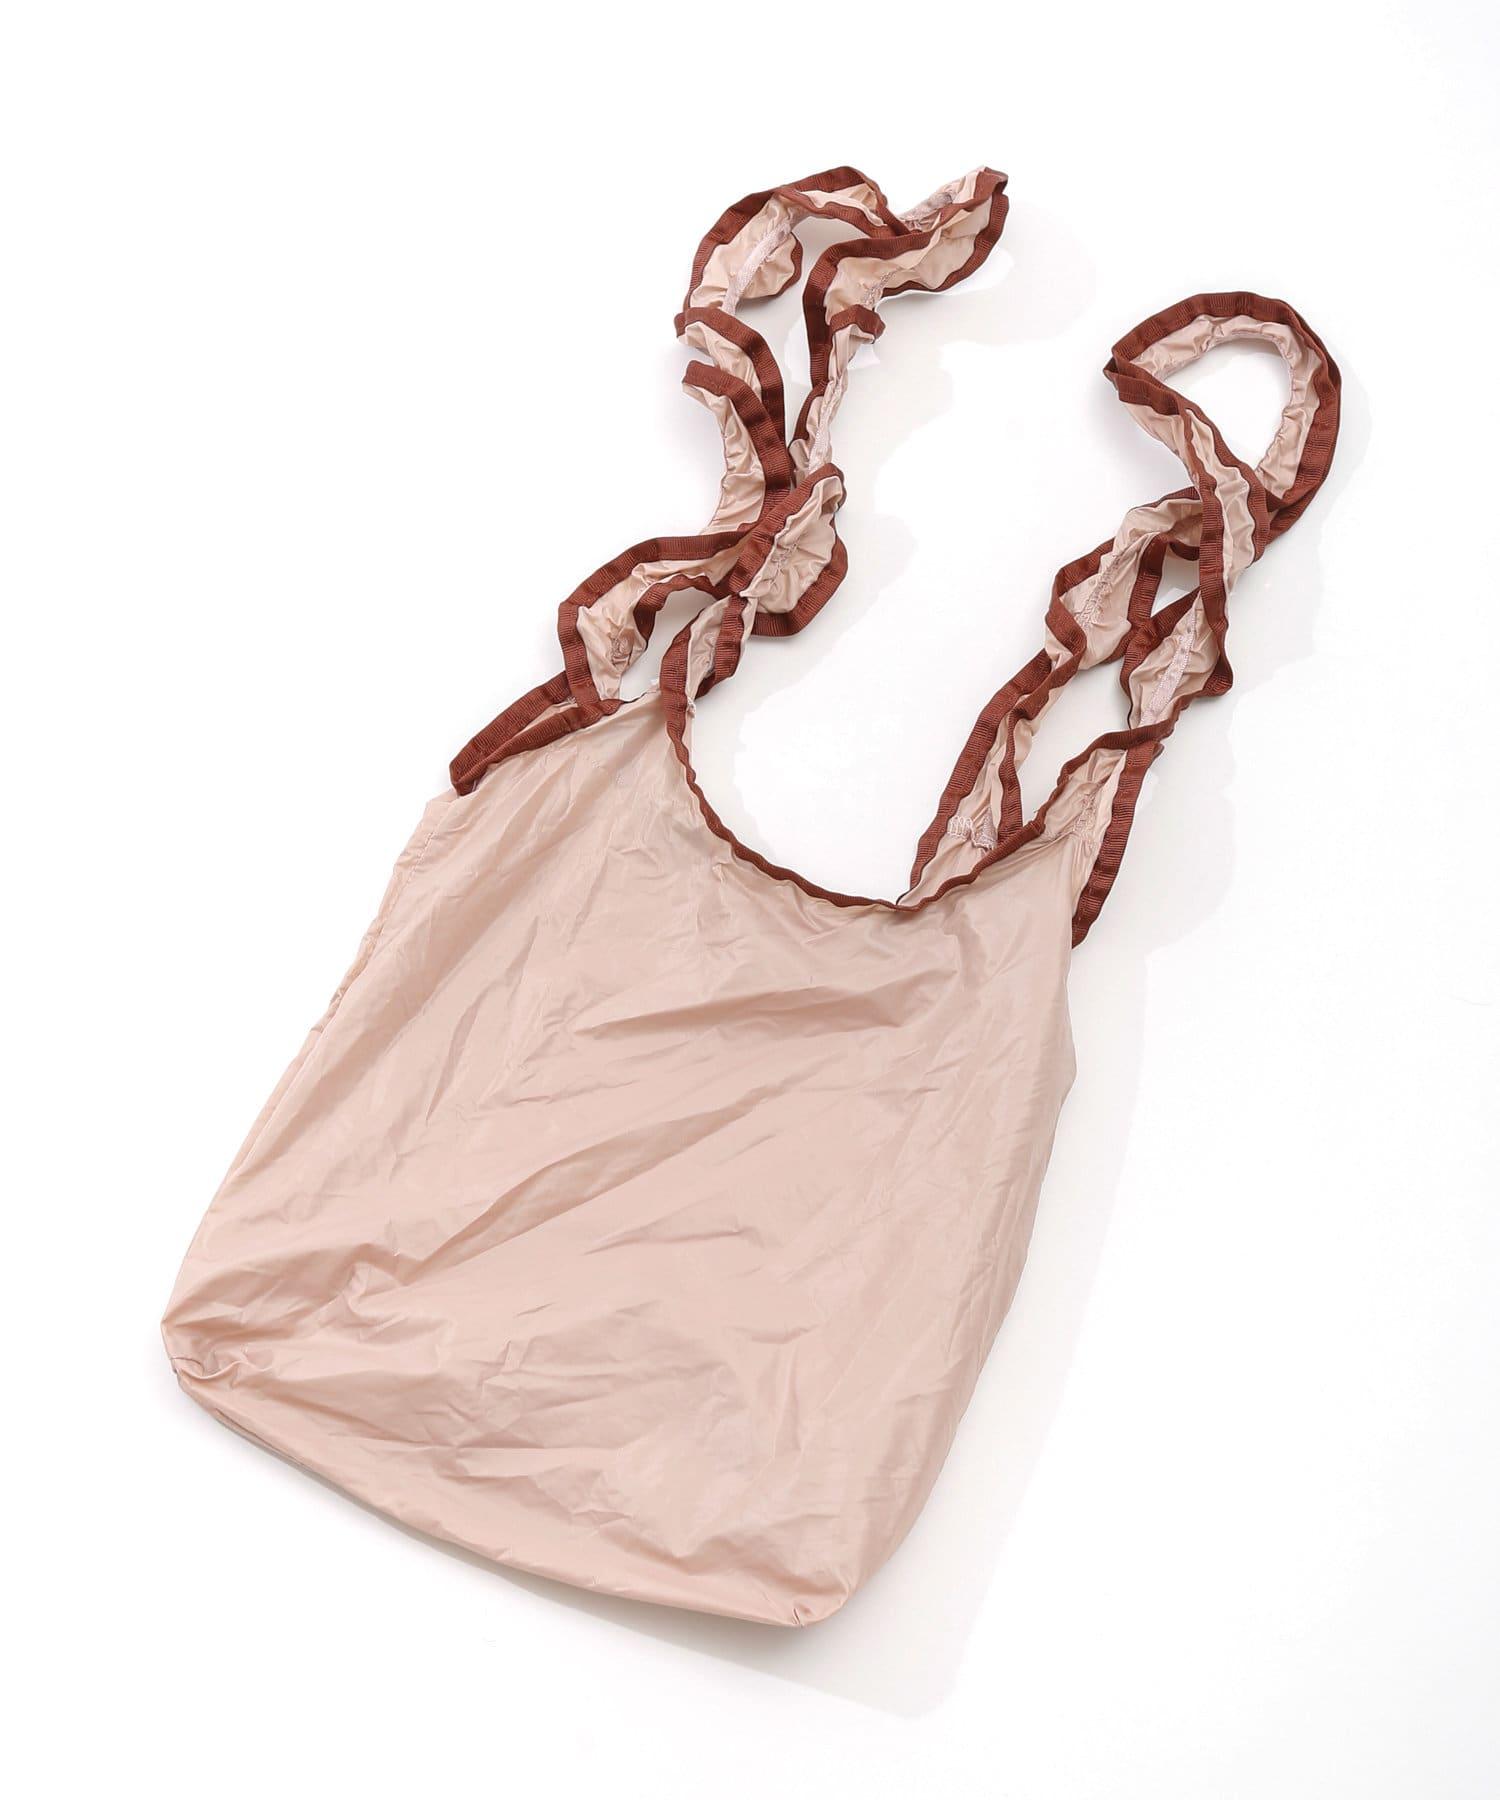 3COINS(スリーコインズ) ライフスタイル 【ワタシの毎日を彩る】フリルバッグ ピンク